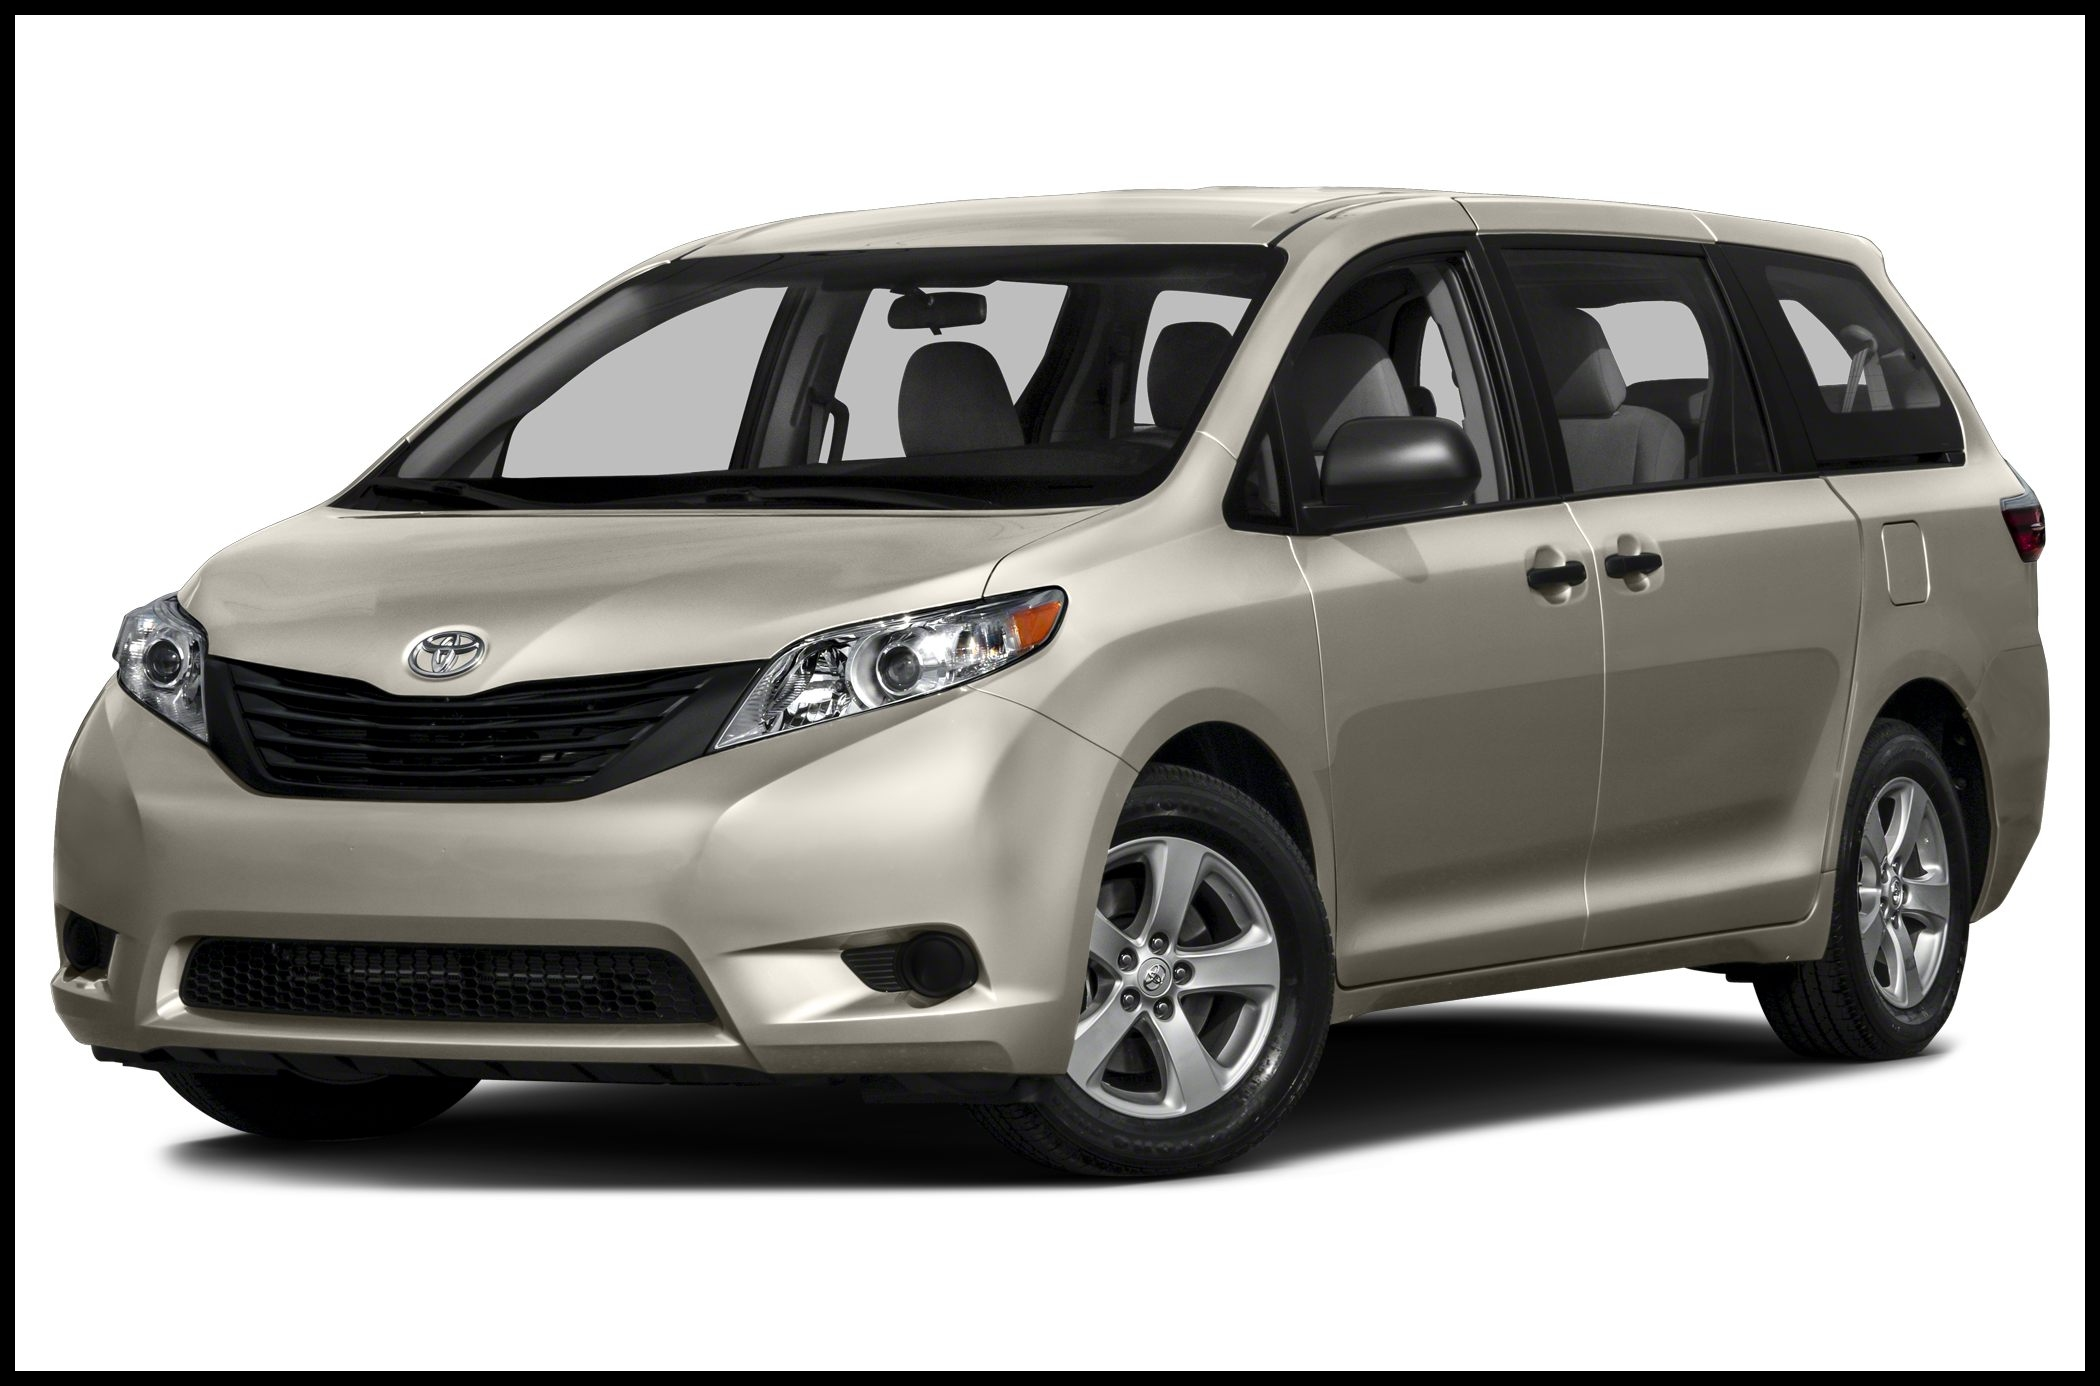 2017 Toyota Sienna L 7 Passenger 4dr Front wheel Drive Passenger Van Safety Features